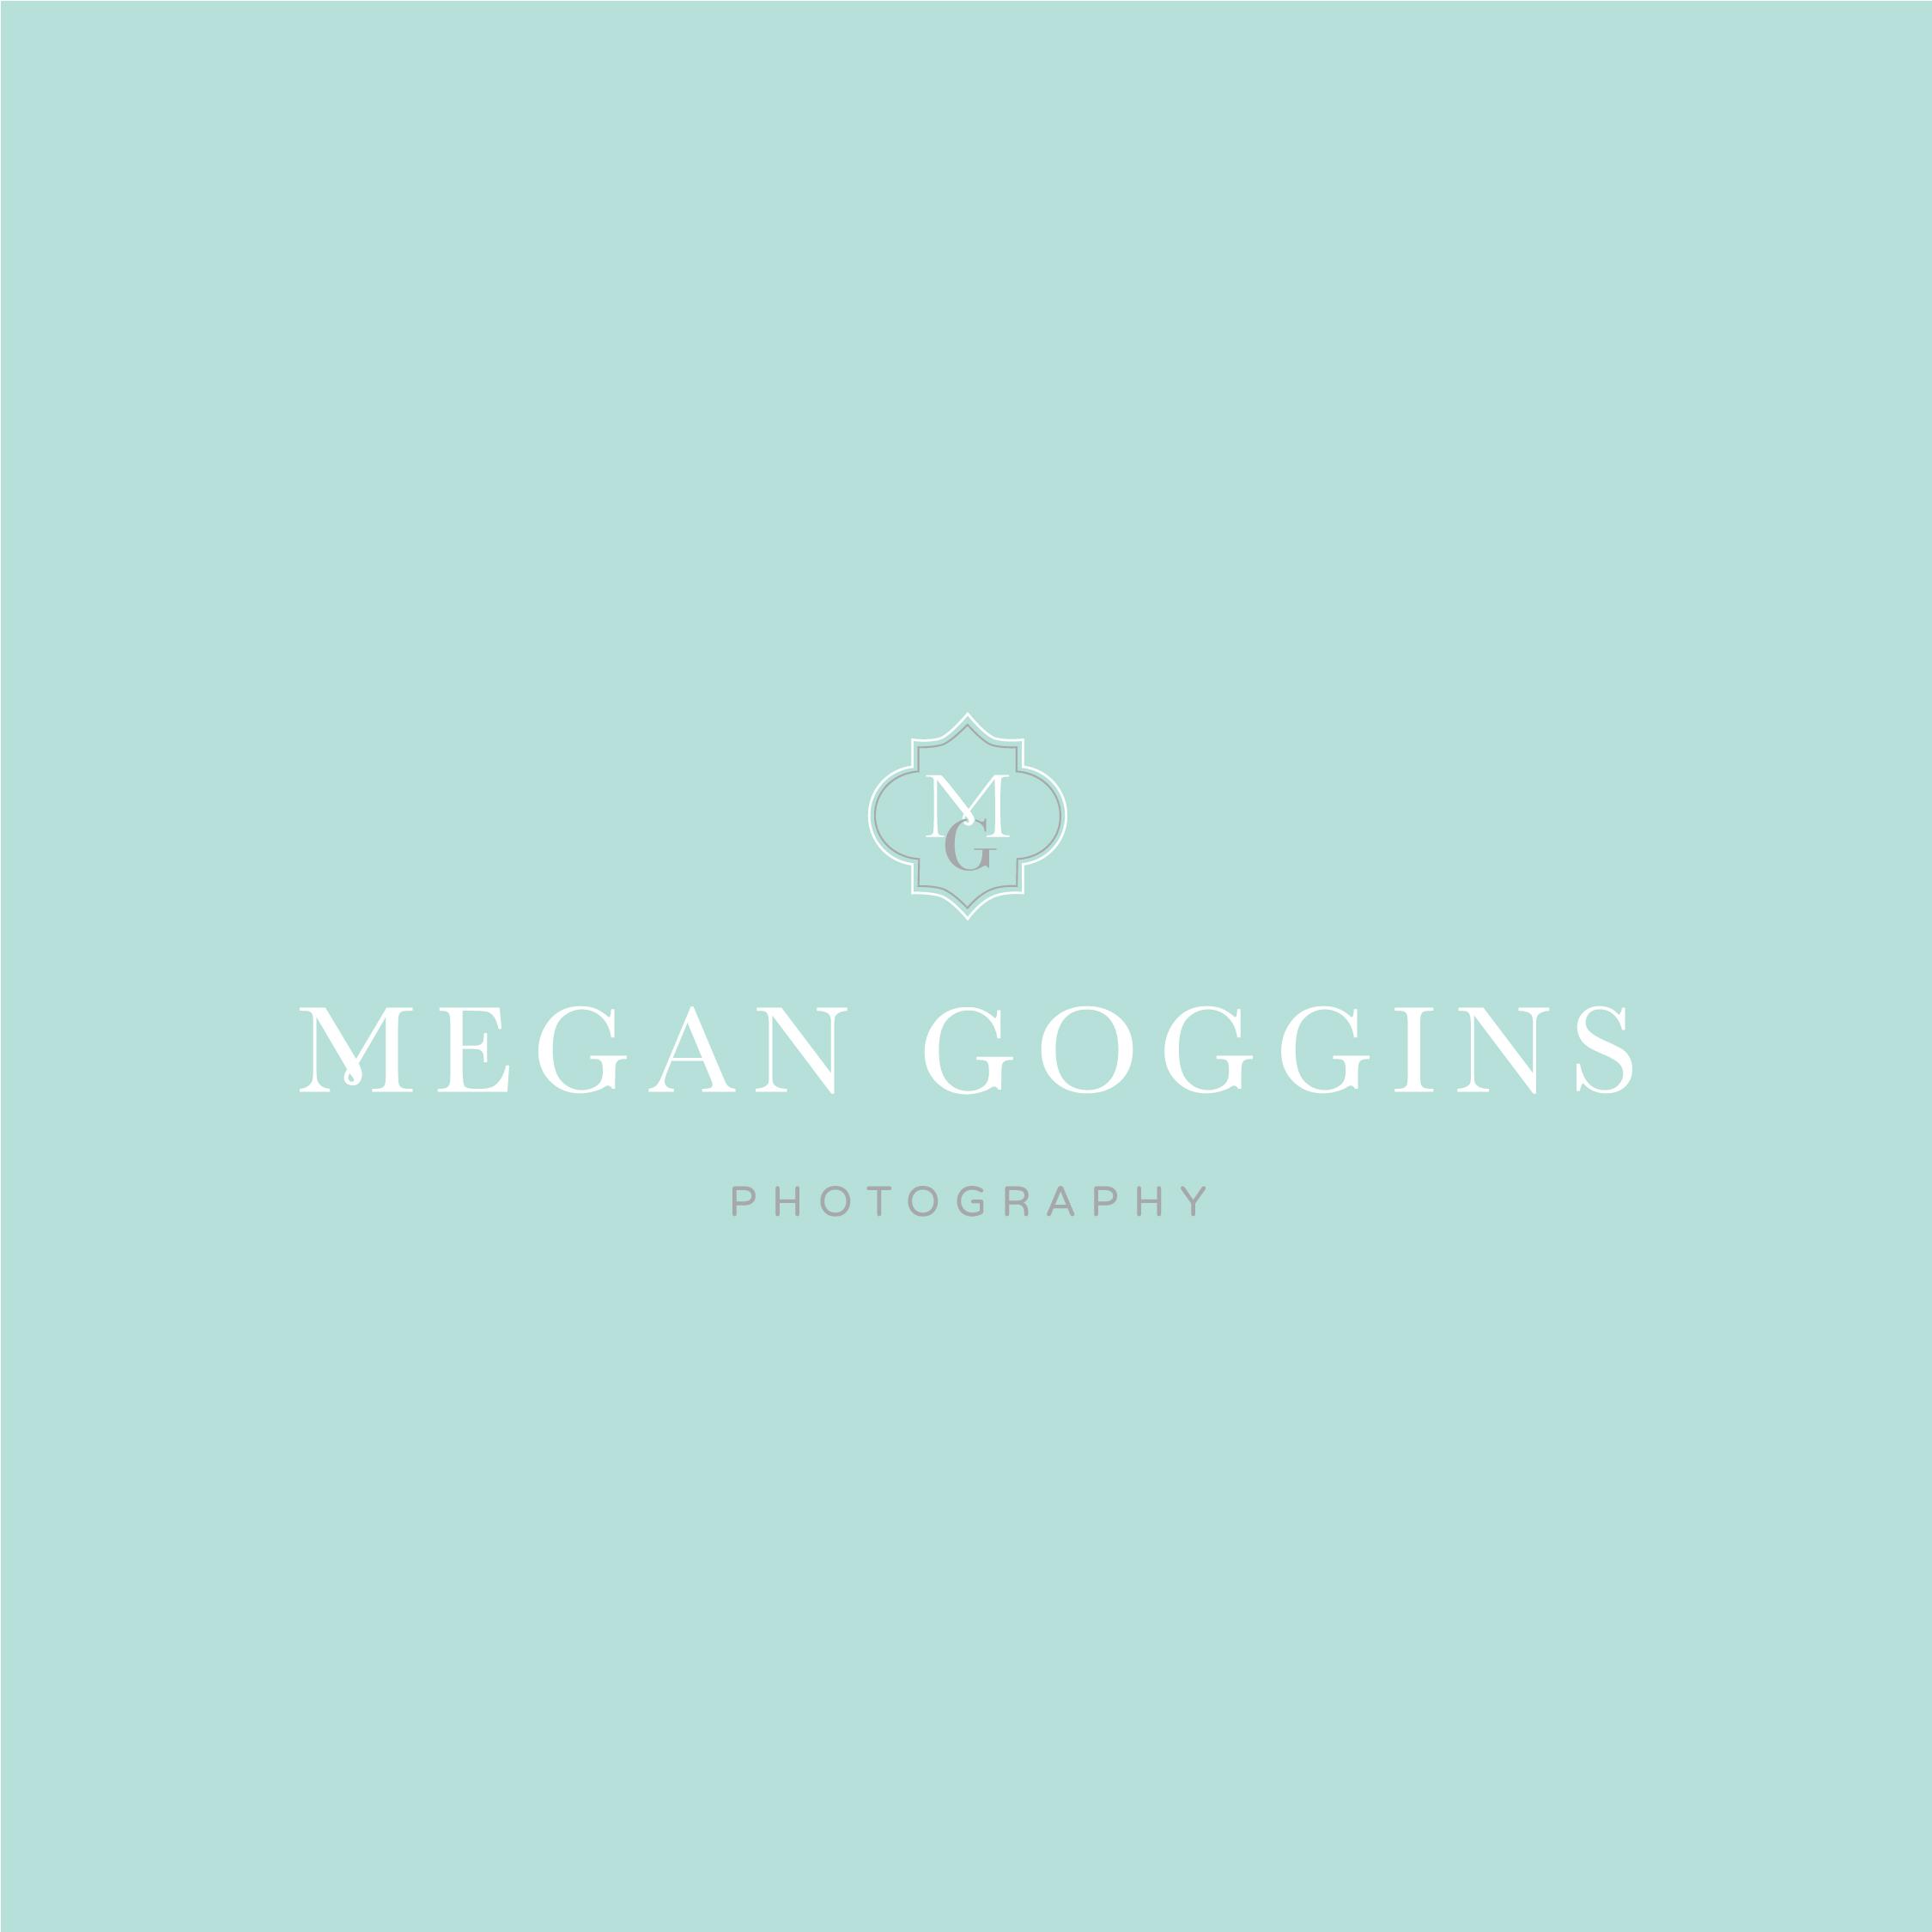 MeganGogginsPhotography-Rebrand-TulsaBrandDesigner.jpg